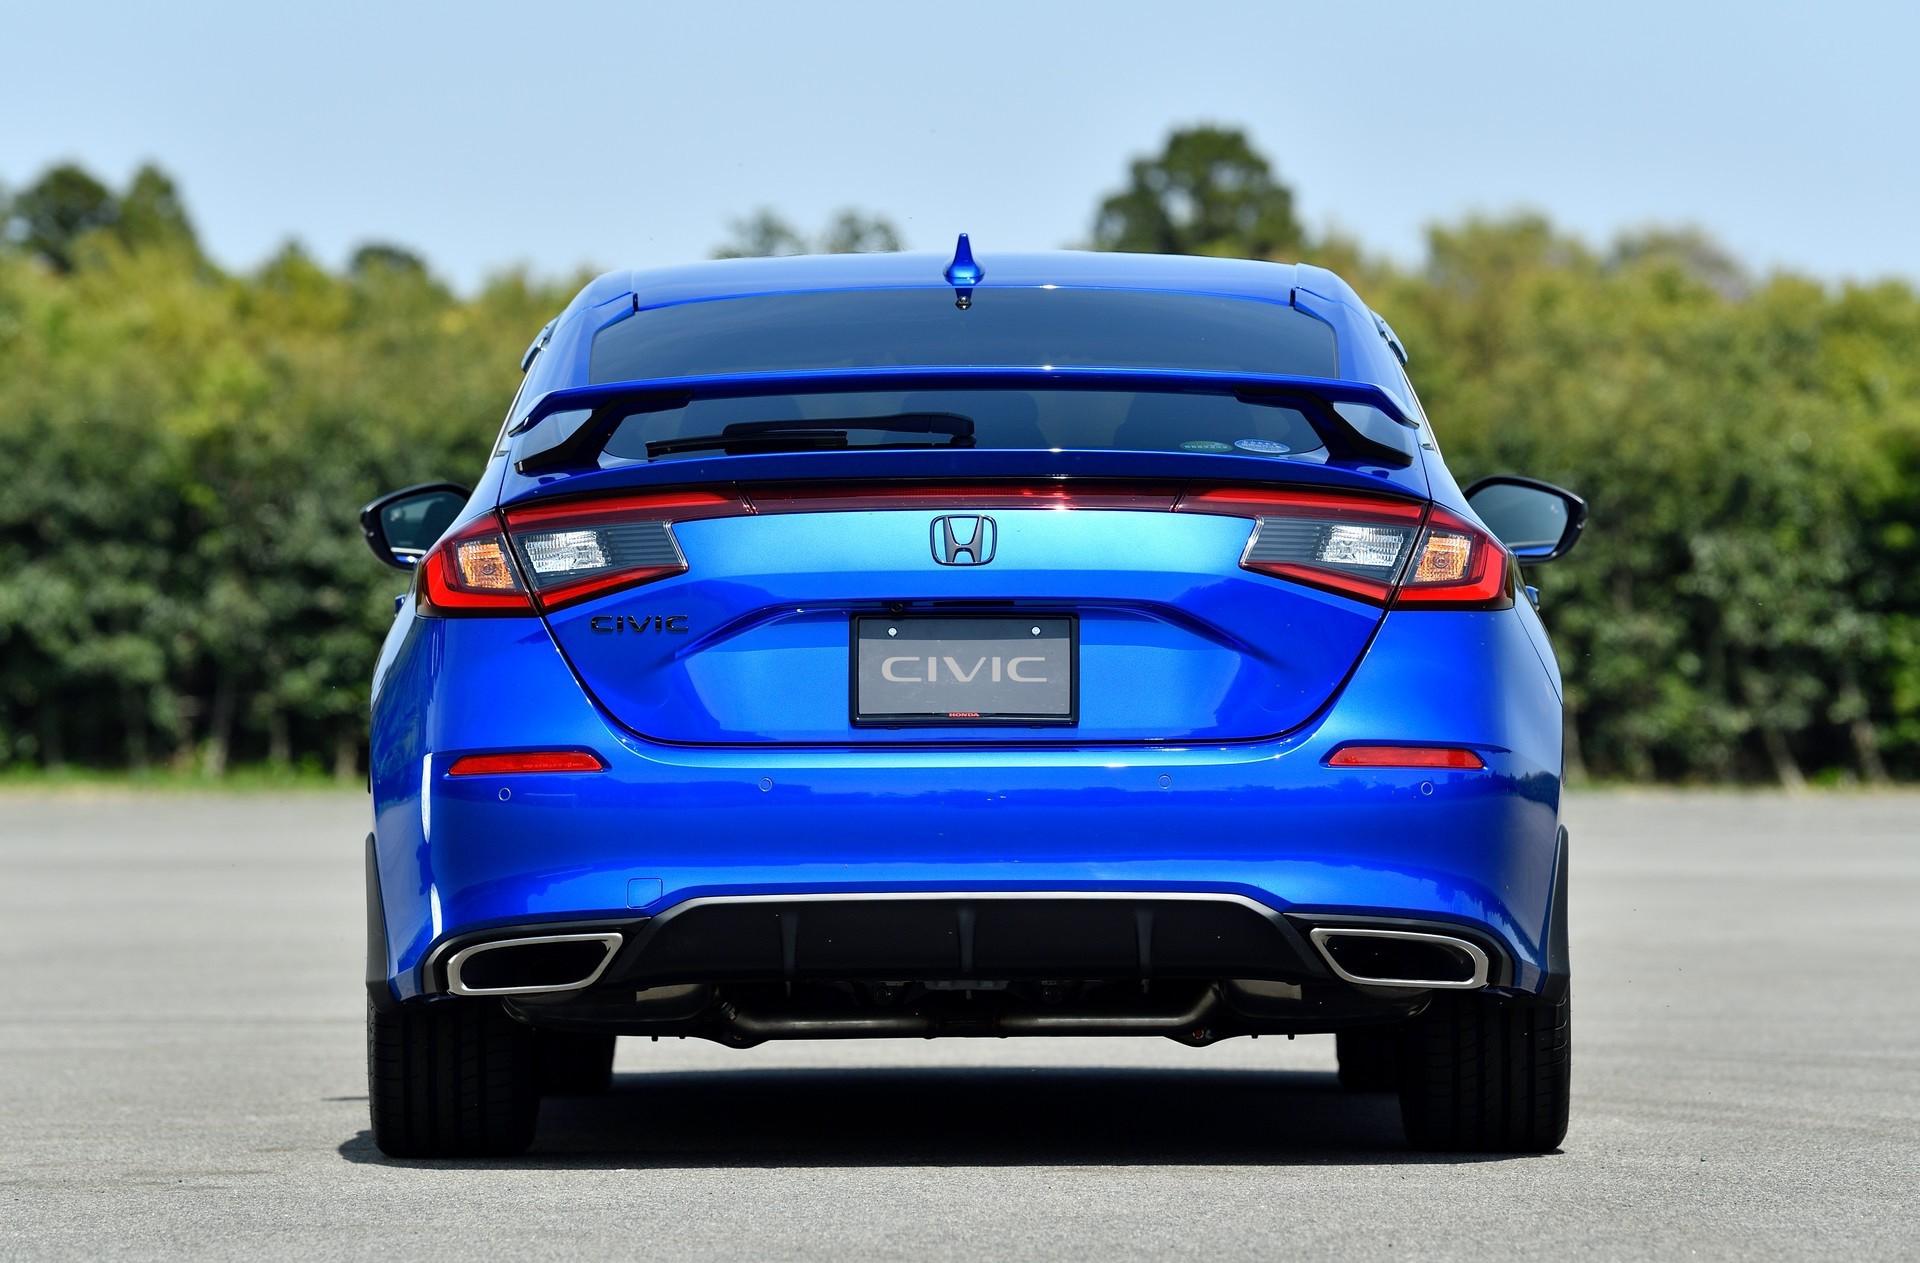 2022-Honda-Civic-Hatch-Accessories-6